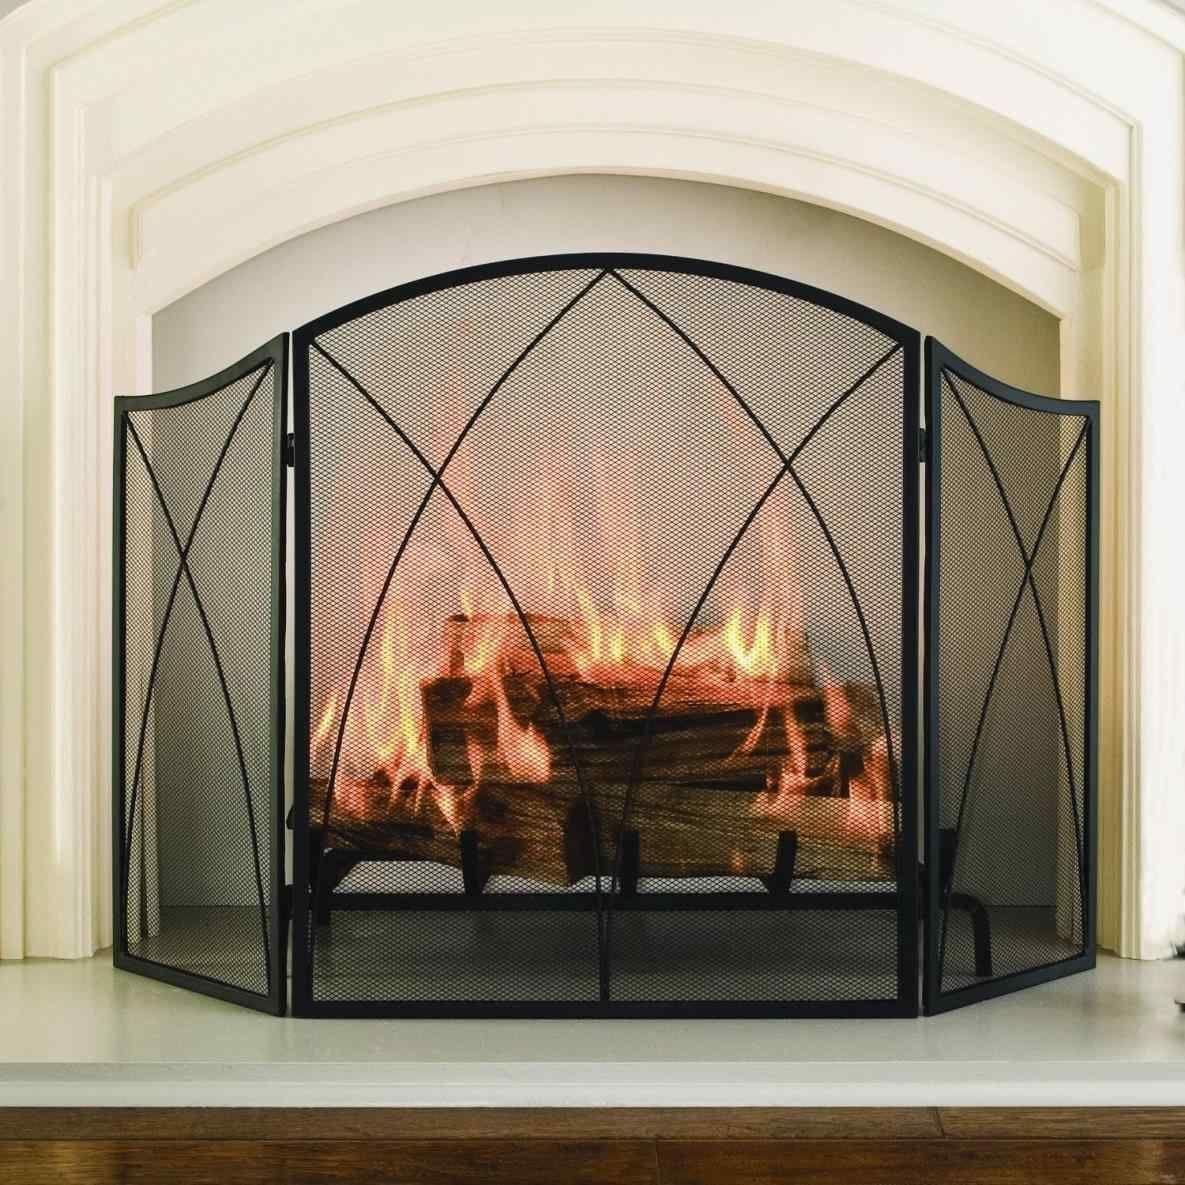 Extra Wide Fireplace Screen Luxury 11 Best Fancy Fireplace Screens Design and Decor Ideas